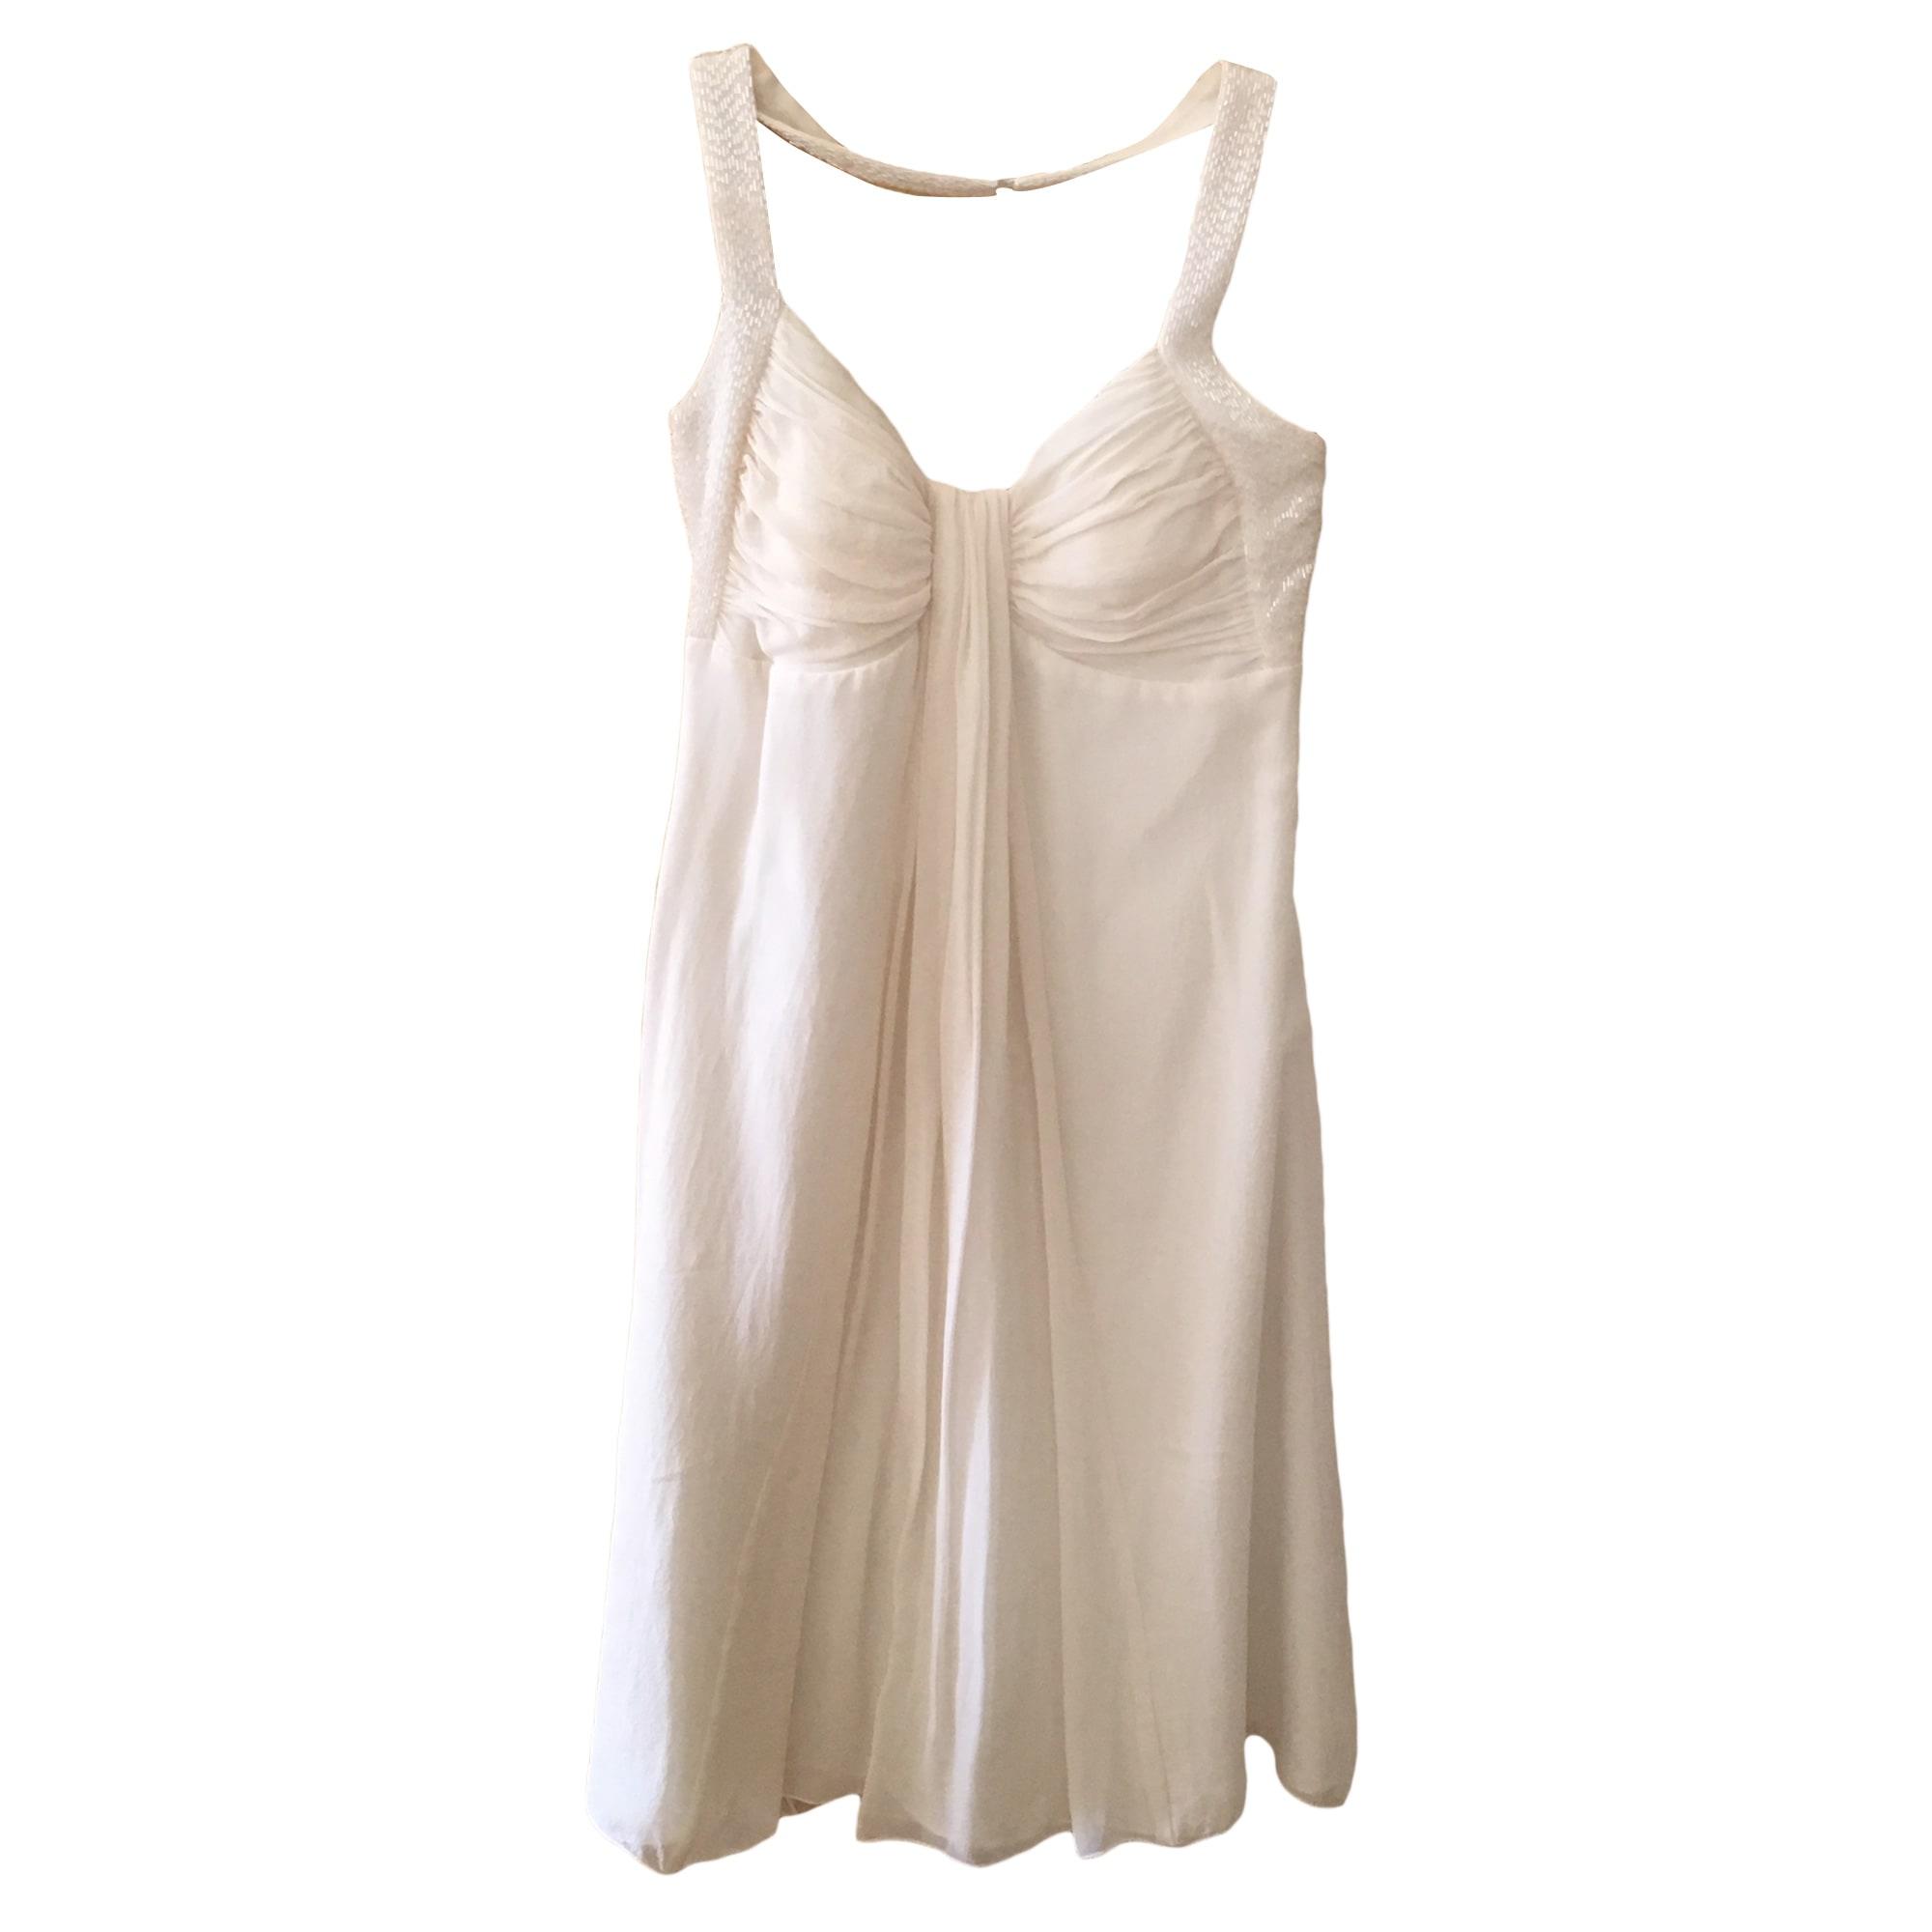 Robe mi-longue 1.2.3 Blanc, blanc cassé, écru